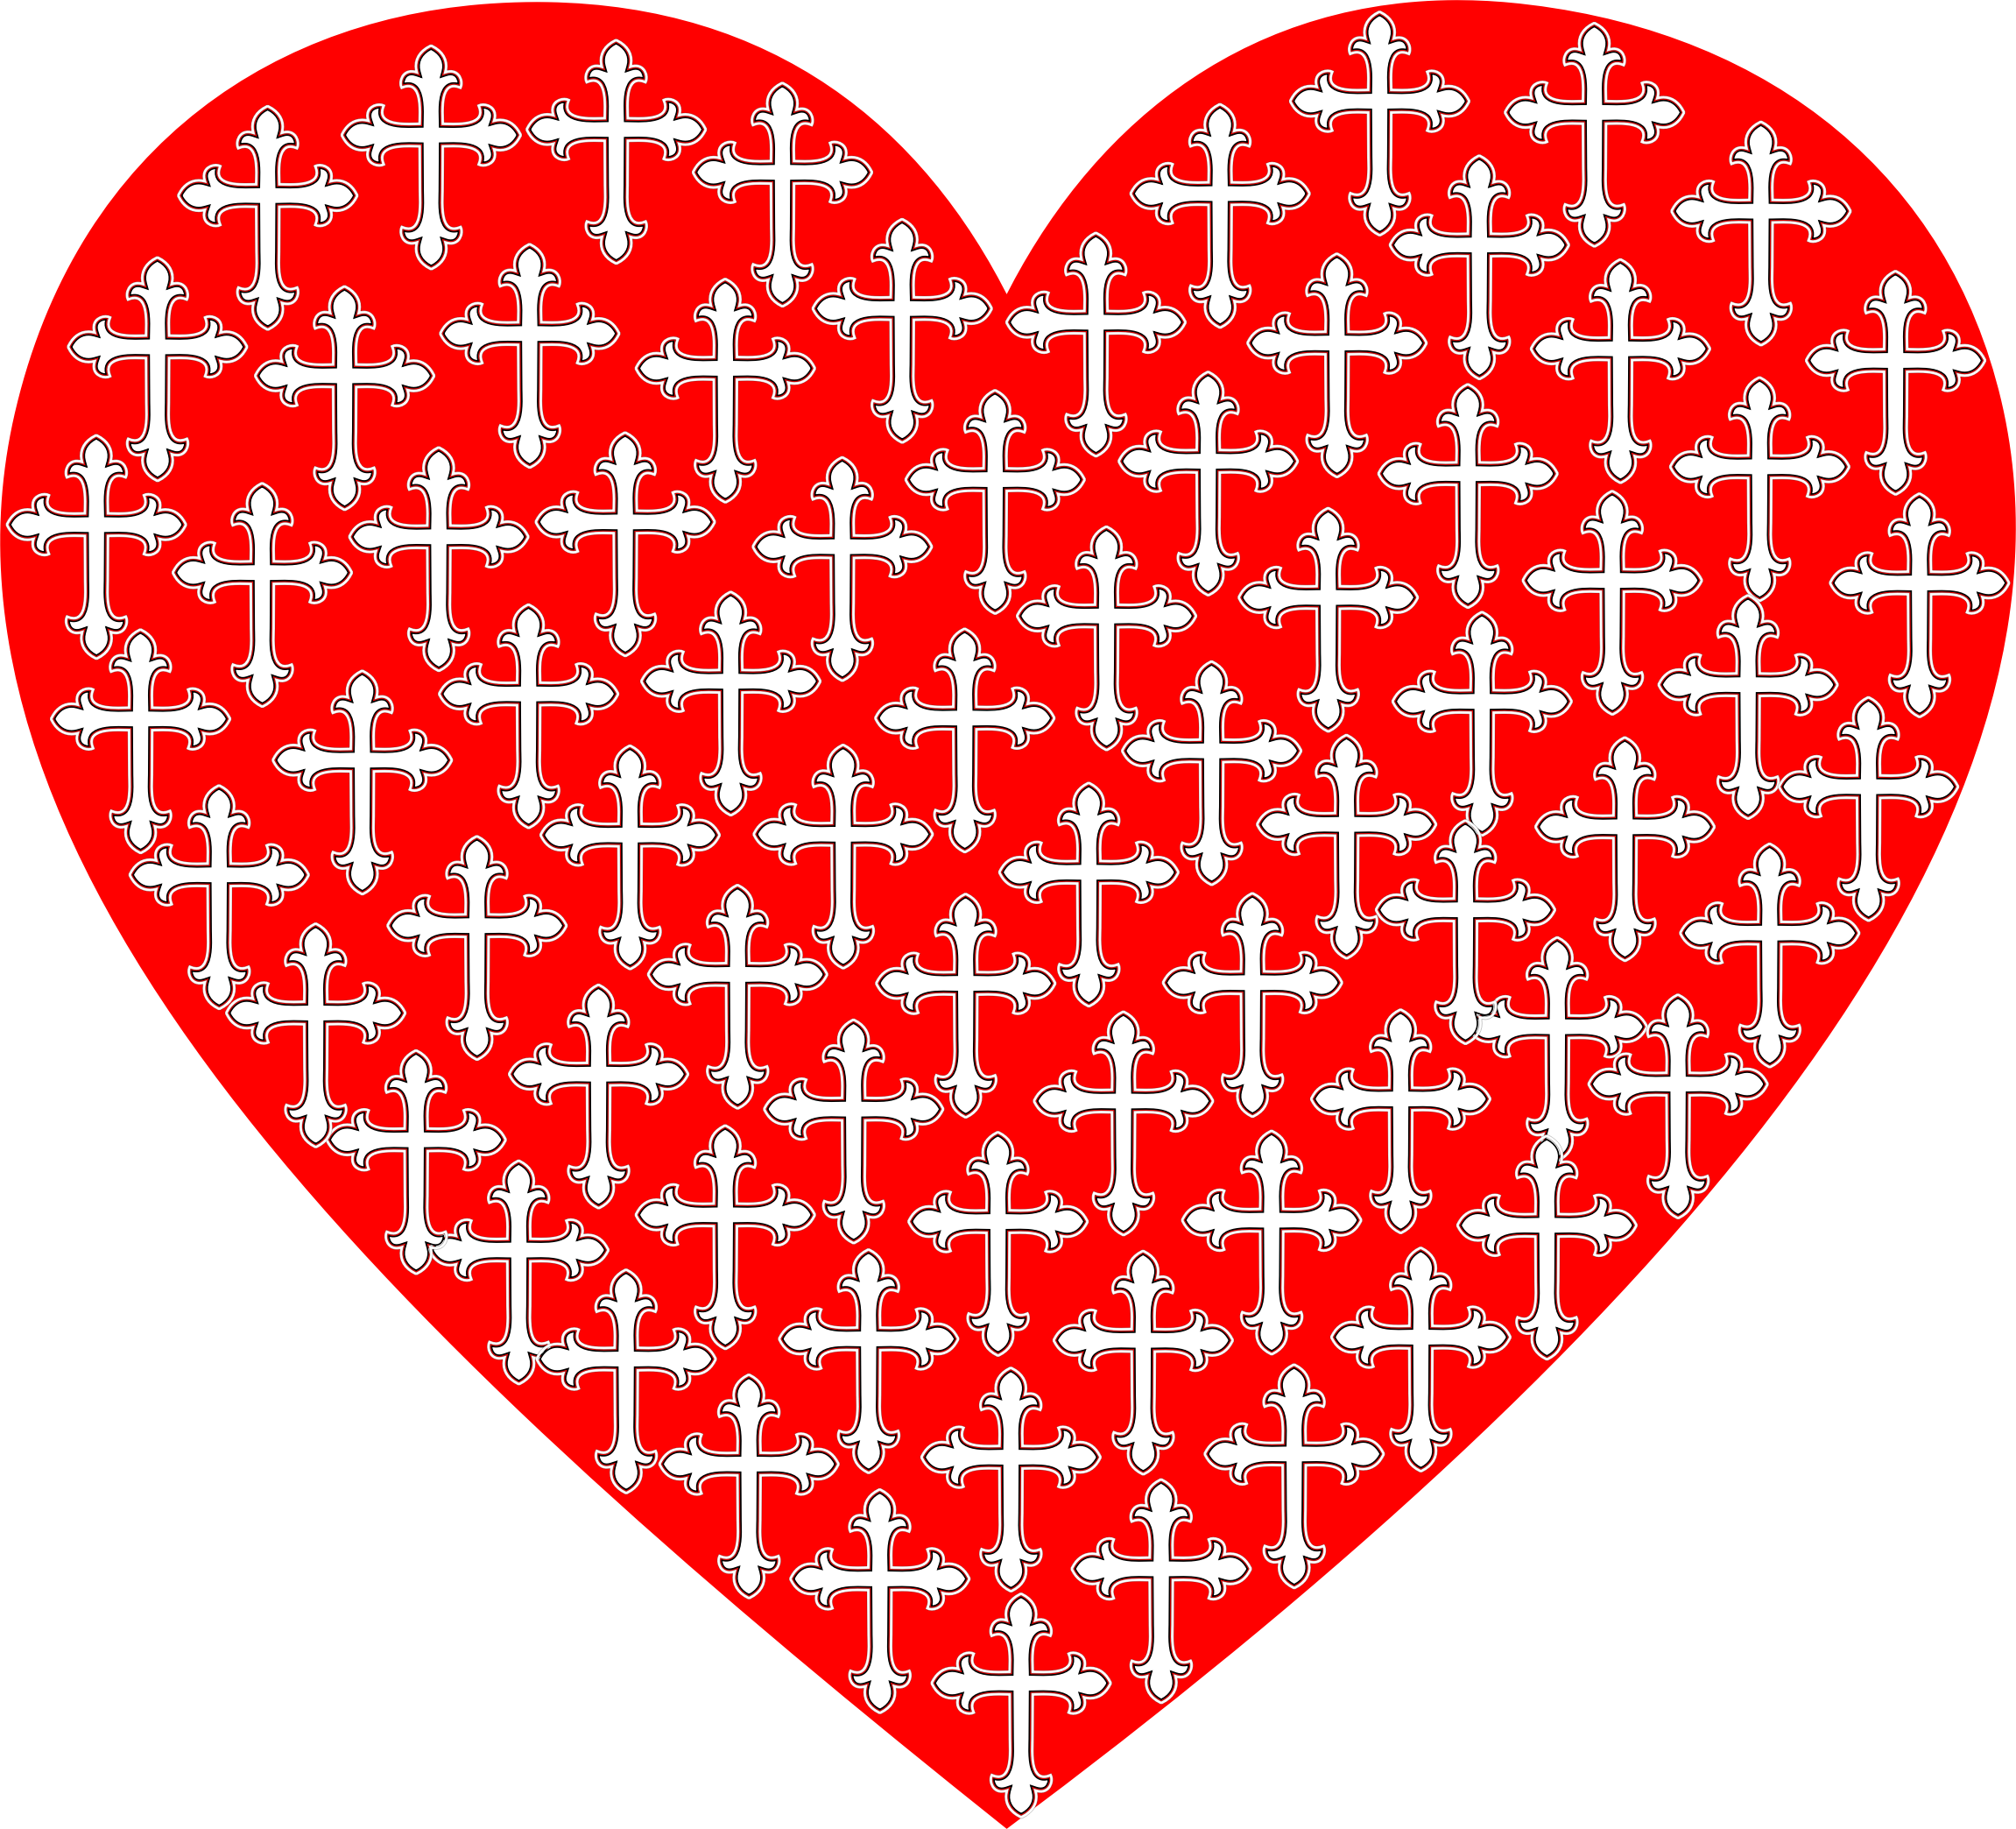 Clipart love cross. Heart crosses big image